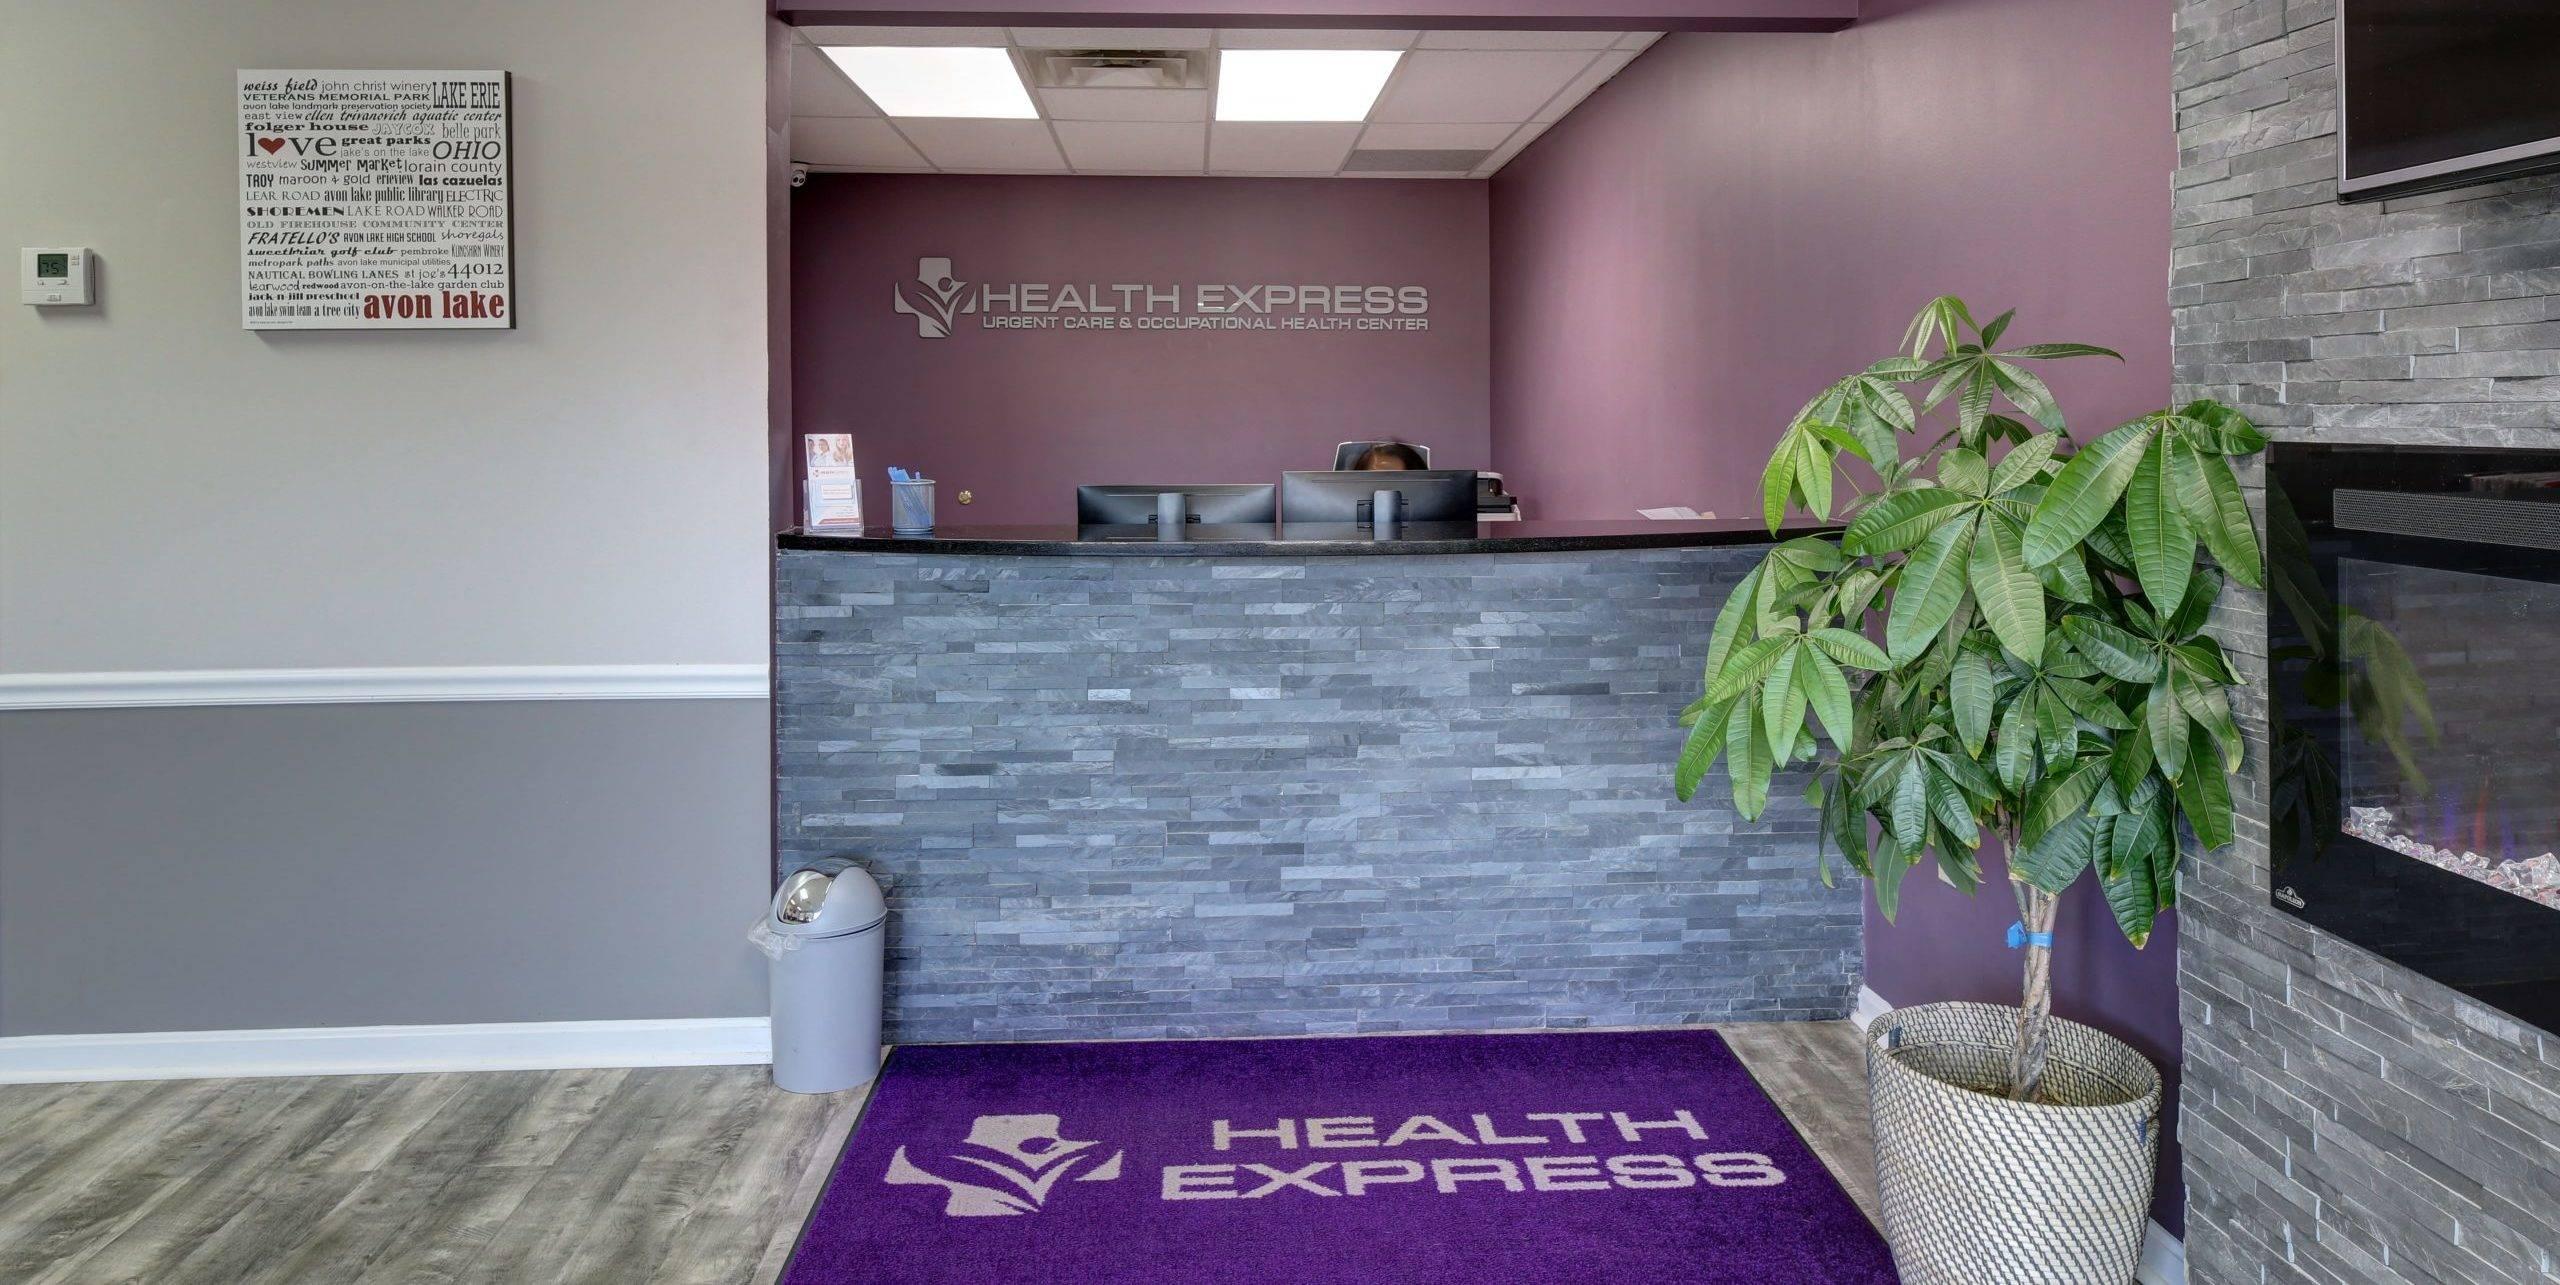 Health Express Urgent Care Avon Lake Ohio Lobby-min